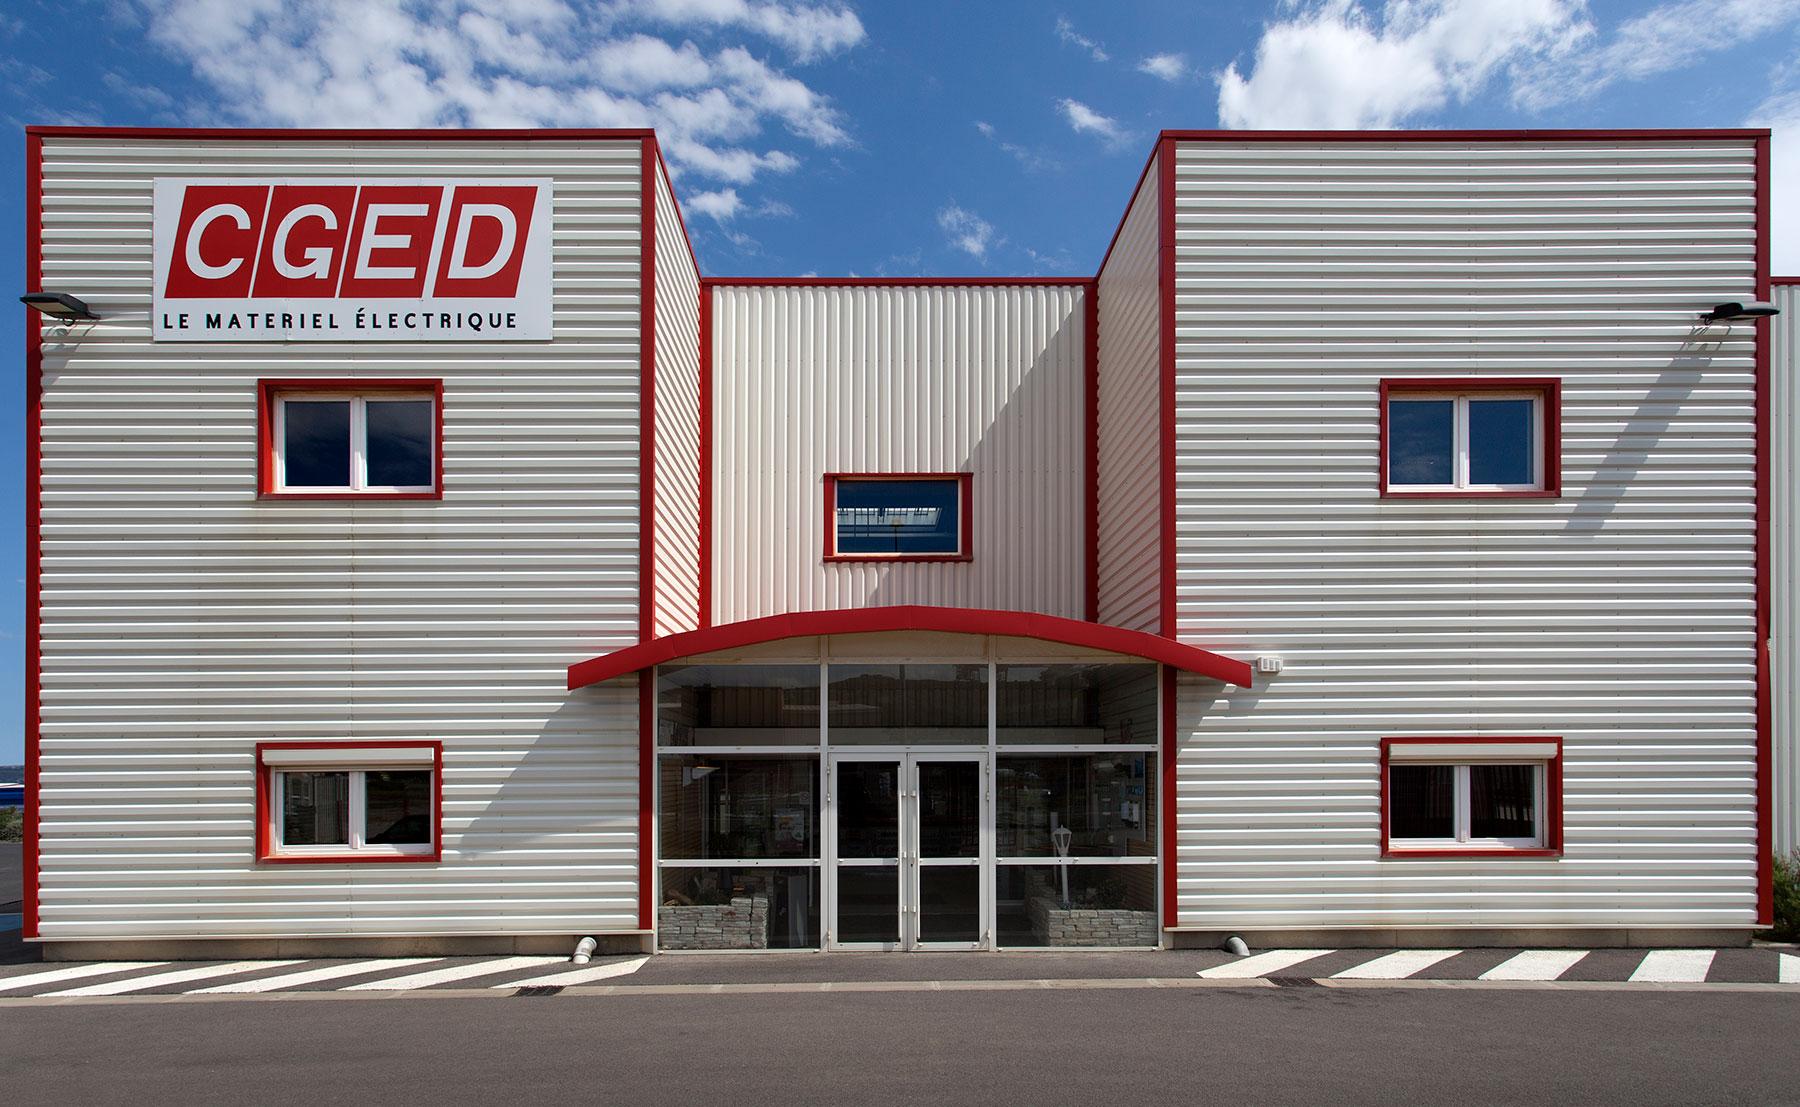 CGED - Bâtiment industriel, entrepôt